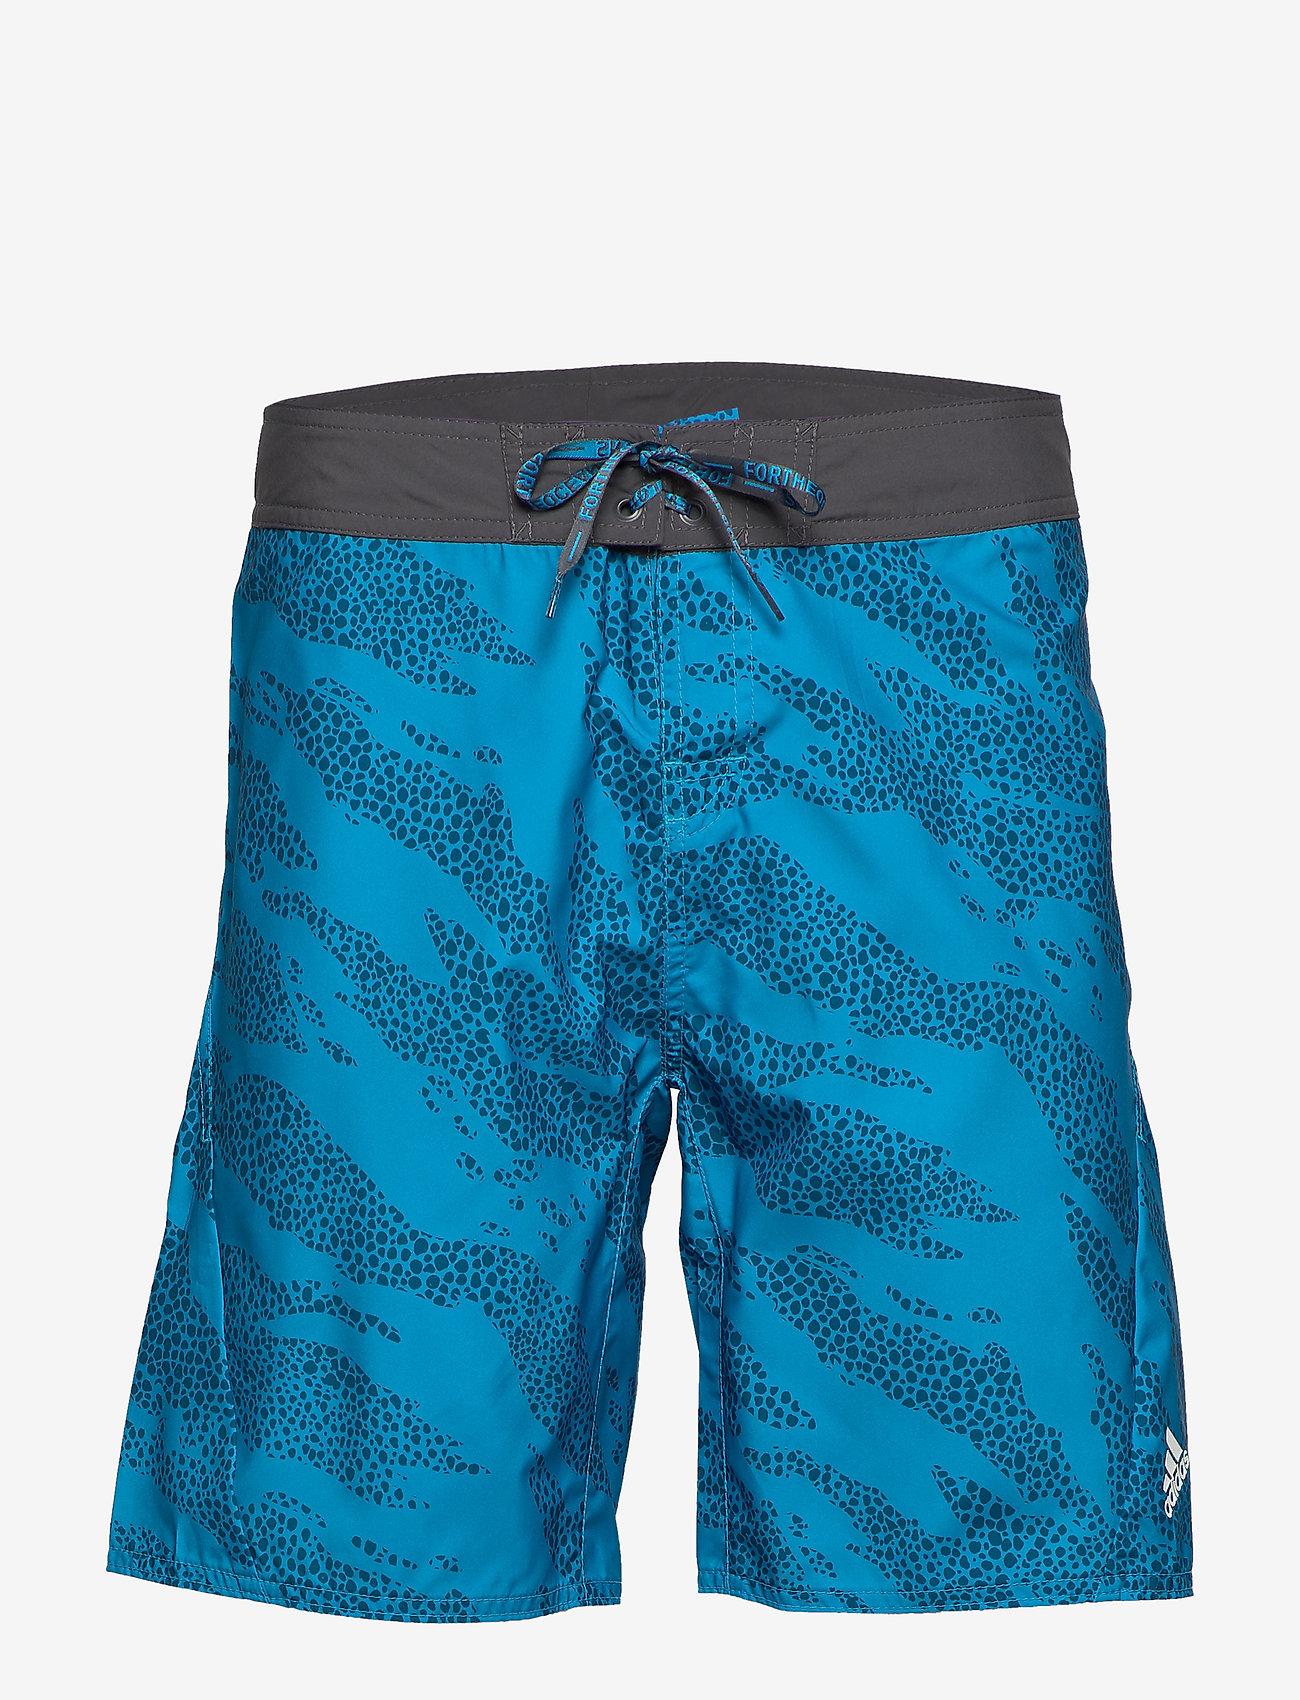 adidas Performance - P.BLUE SH TECH - uimashortsit - shablu - 1